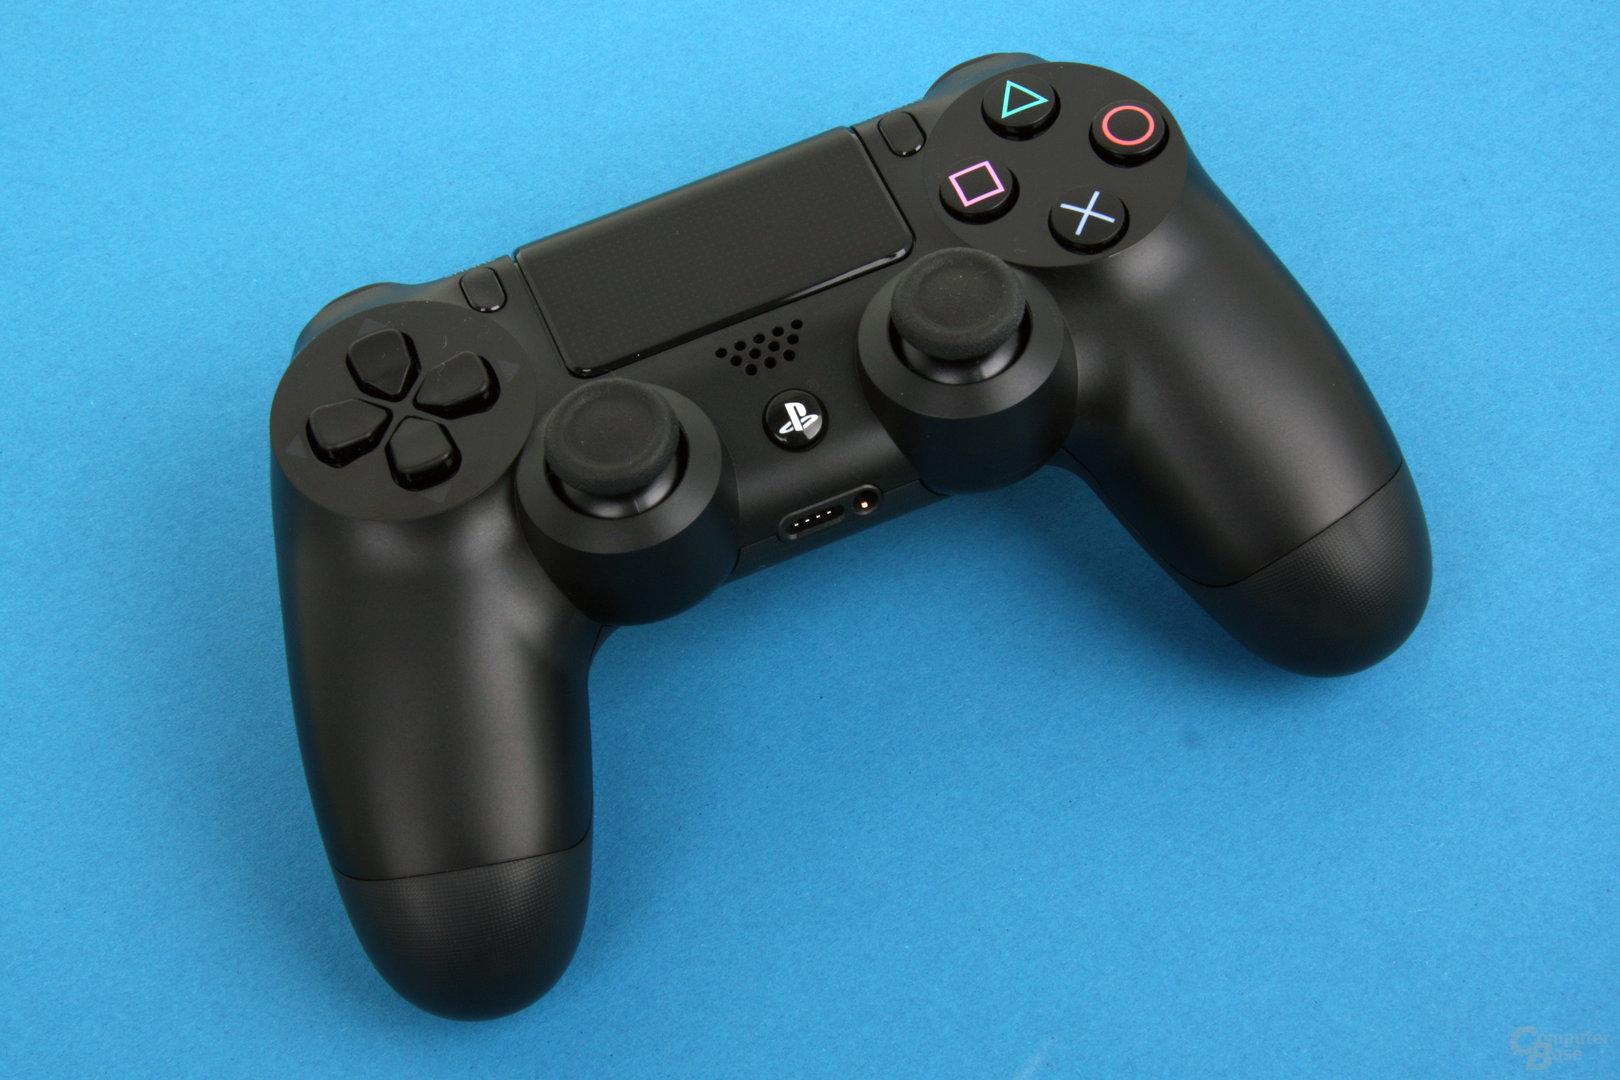 PlayStation 4: Dualshock 4 Controller